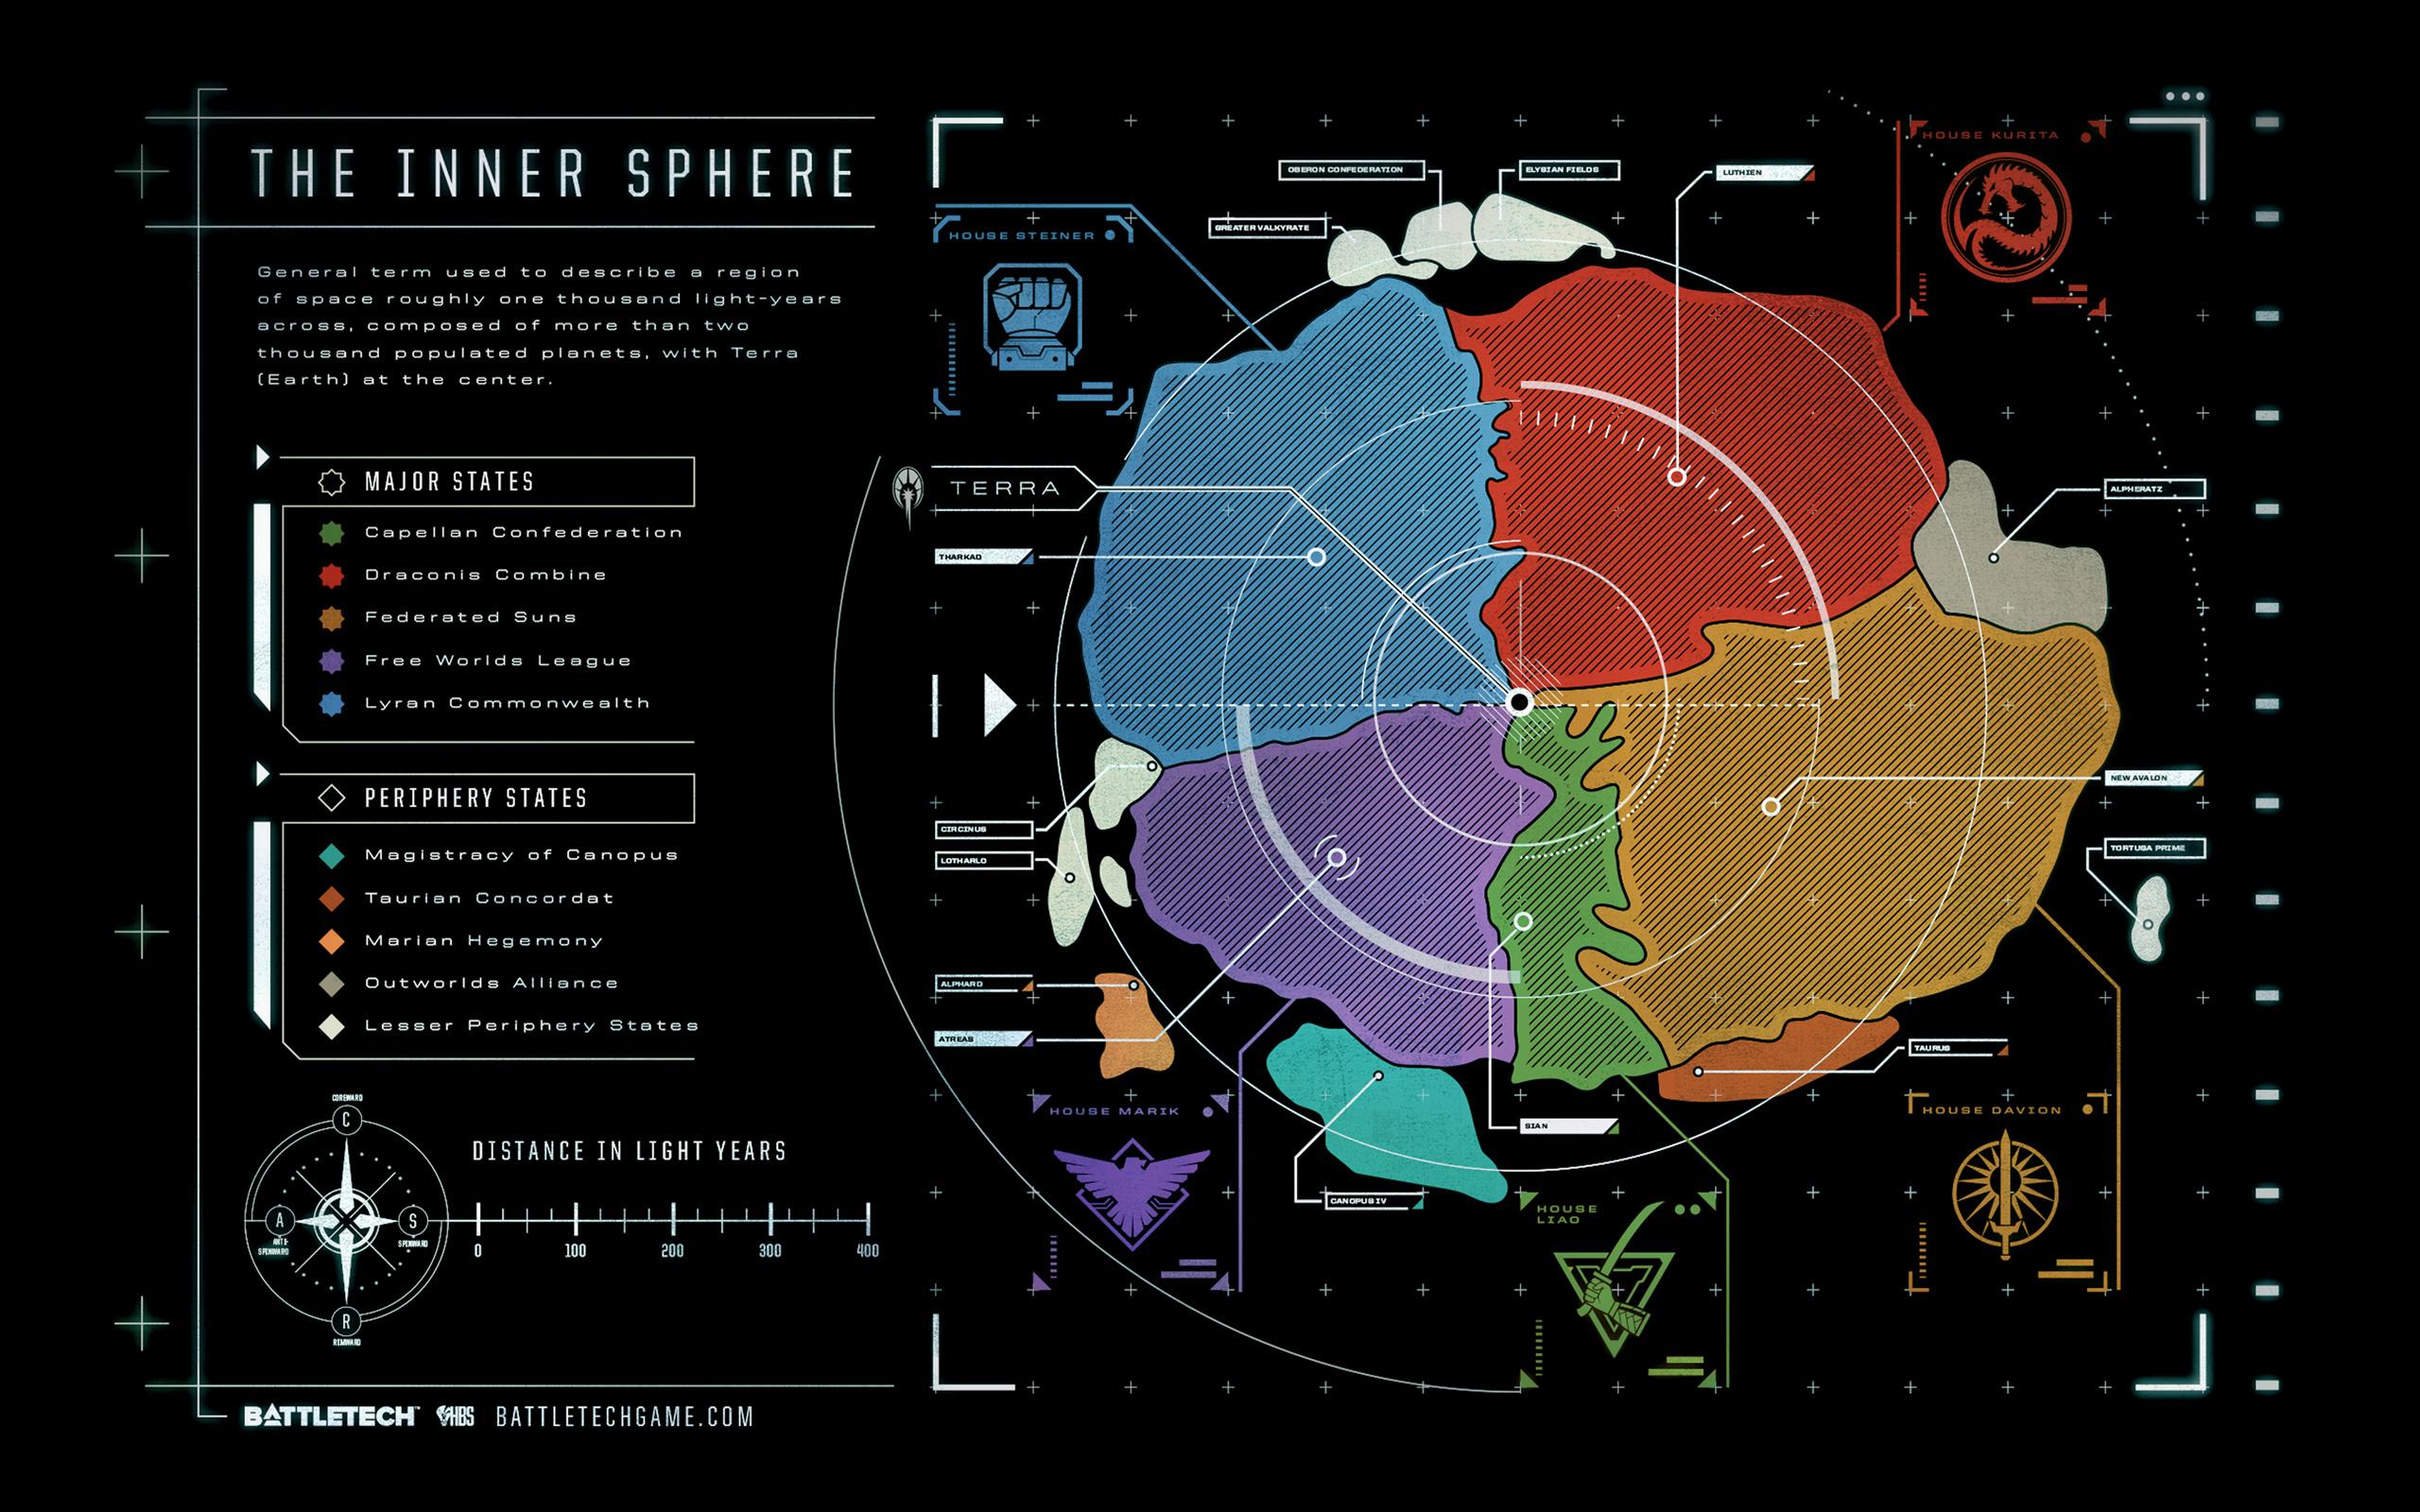 The Inner Sphere Circa 3025